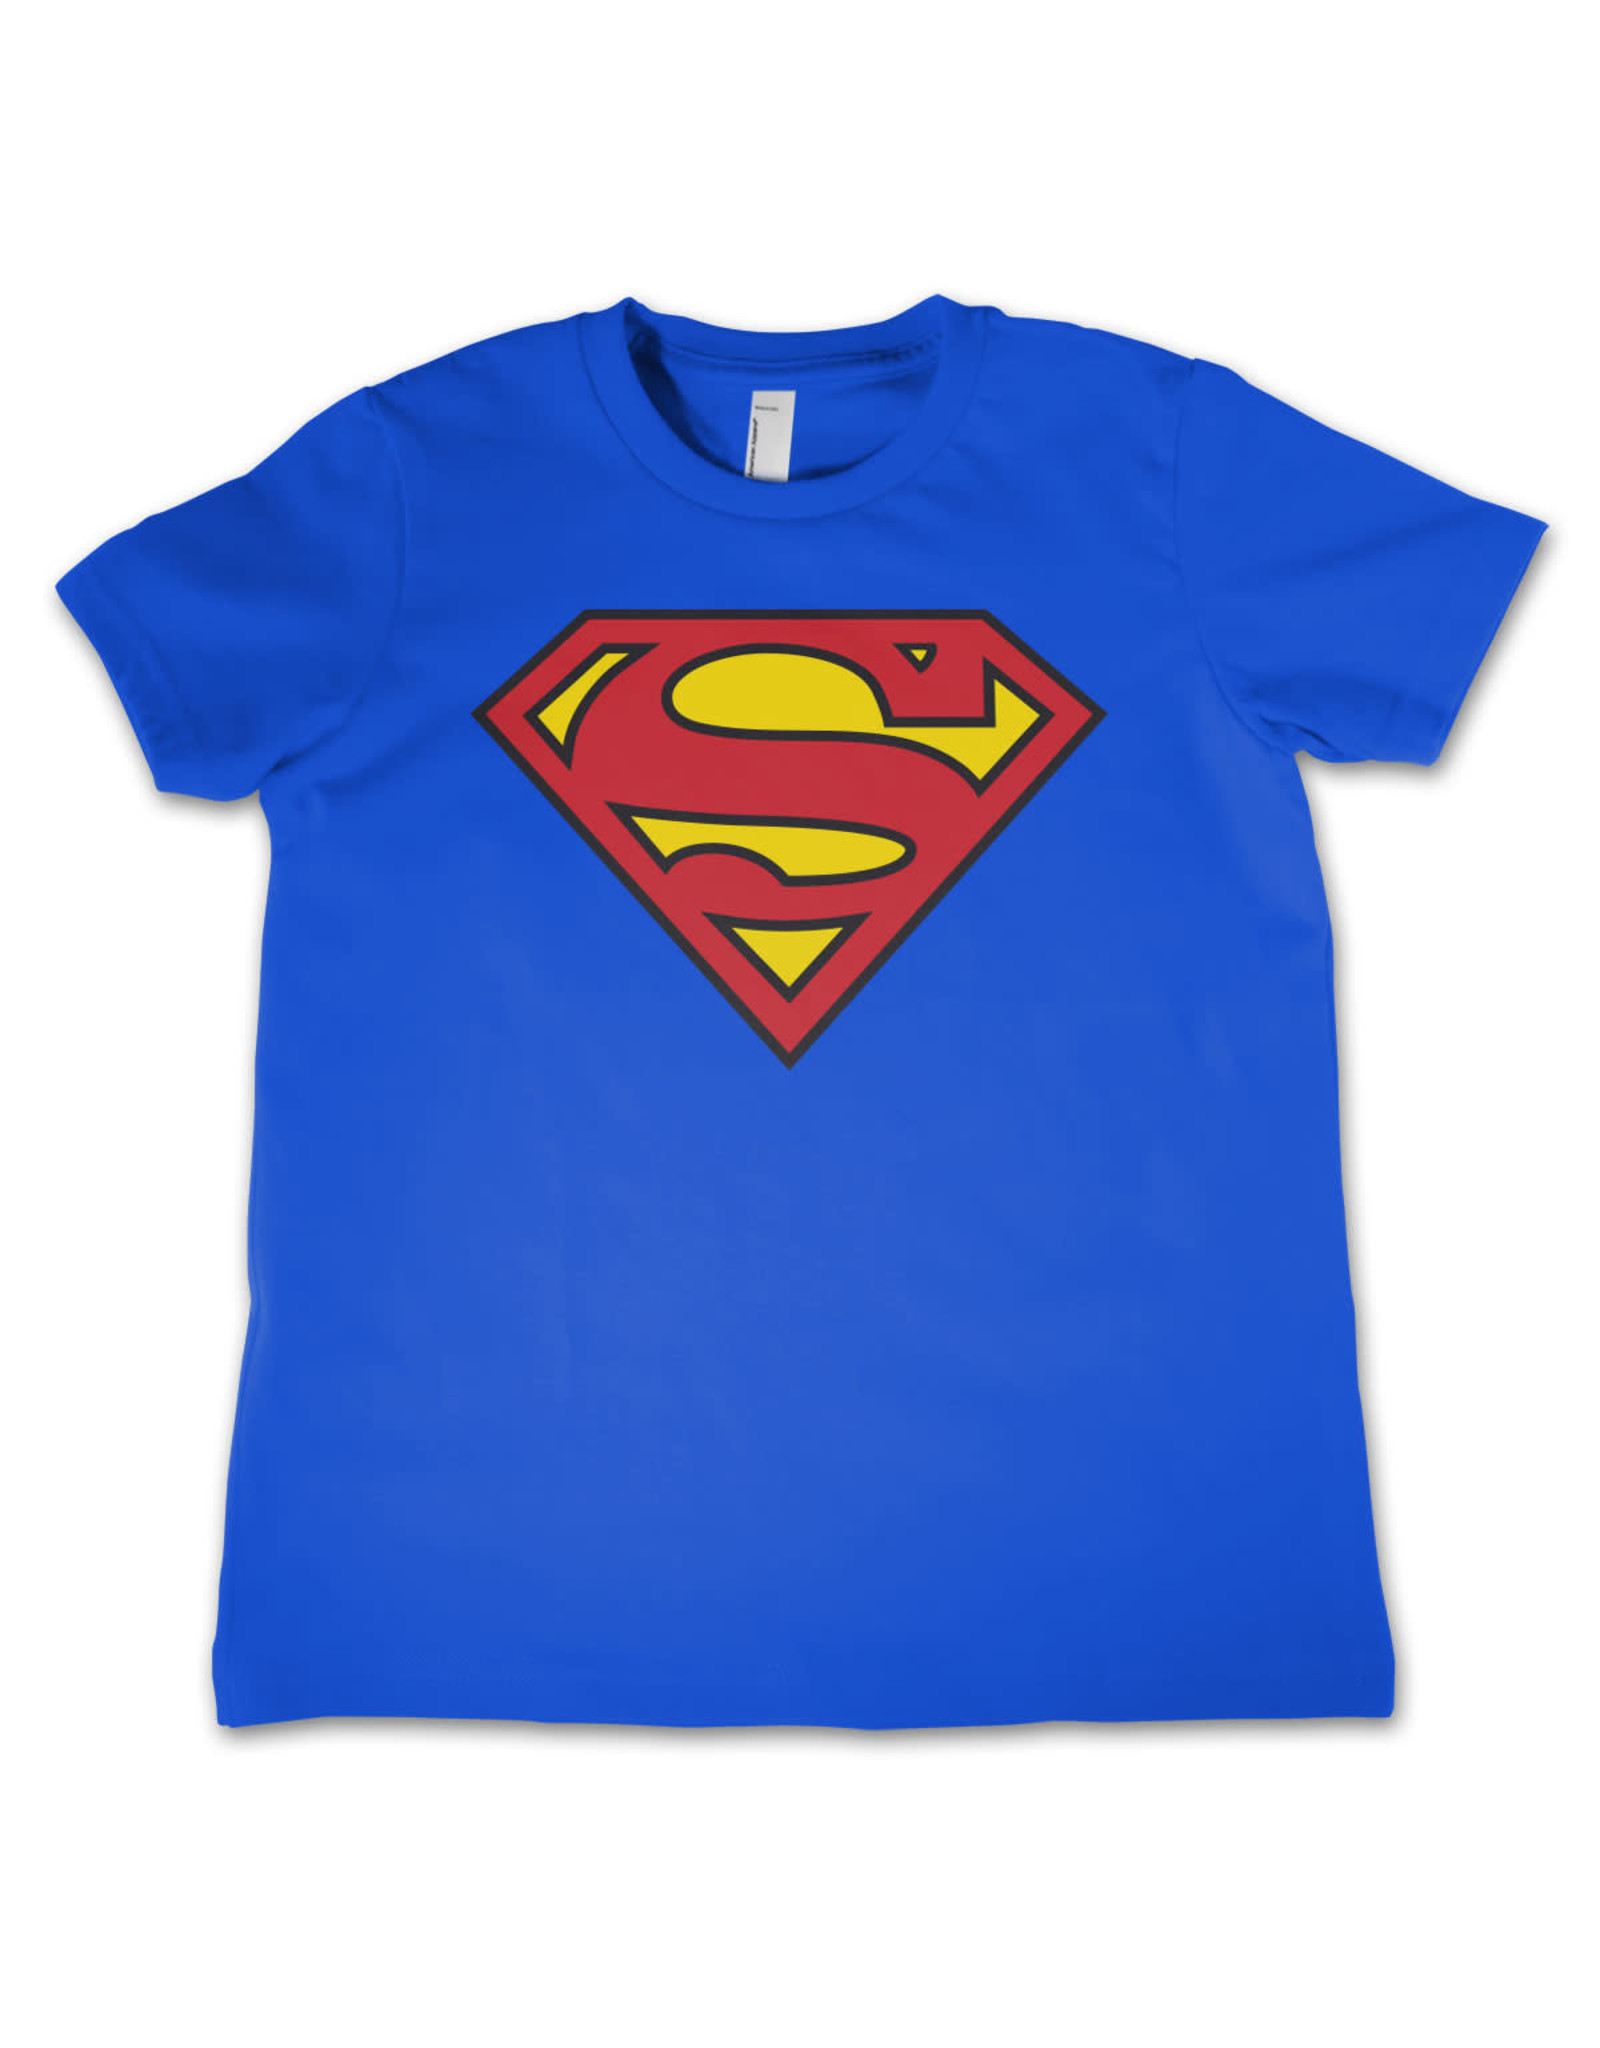 SUPERMAN - T-Shirt KIDS Shield Blue (4 Years)